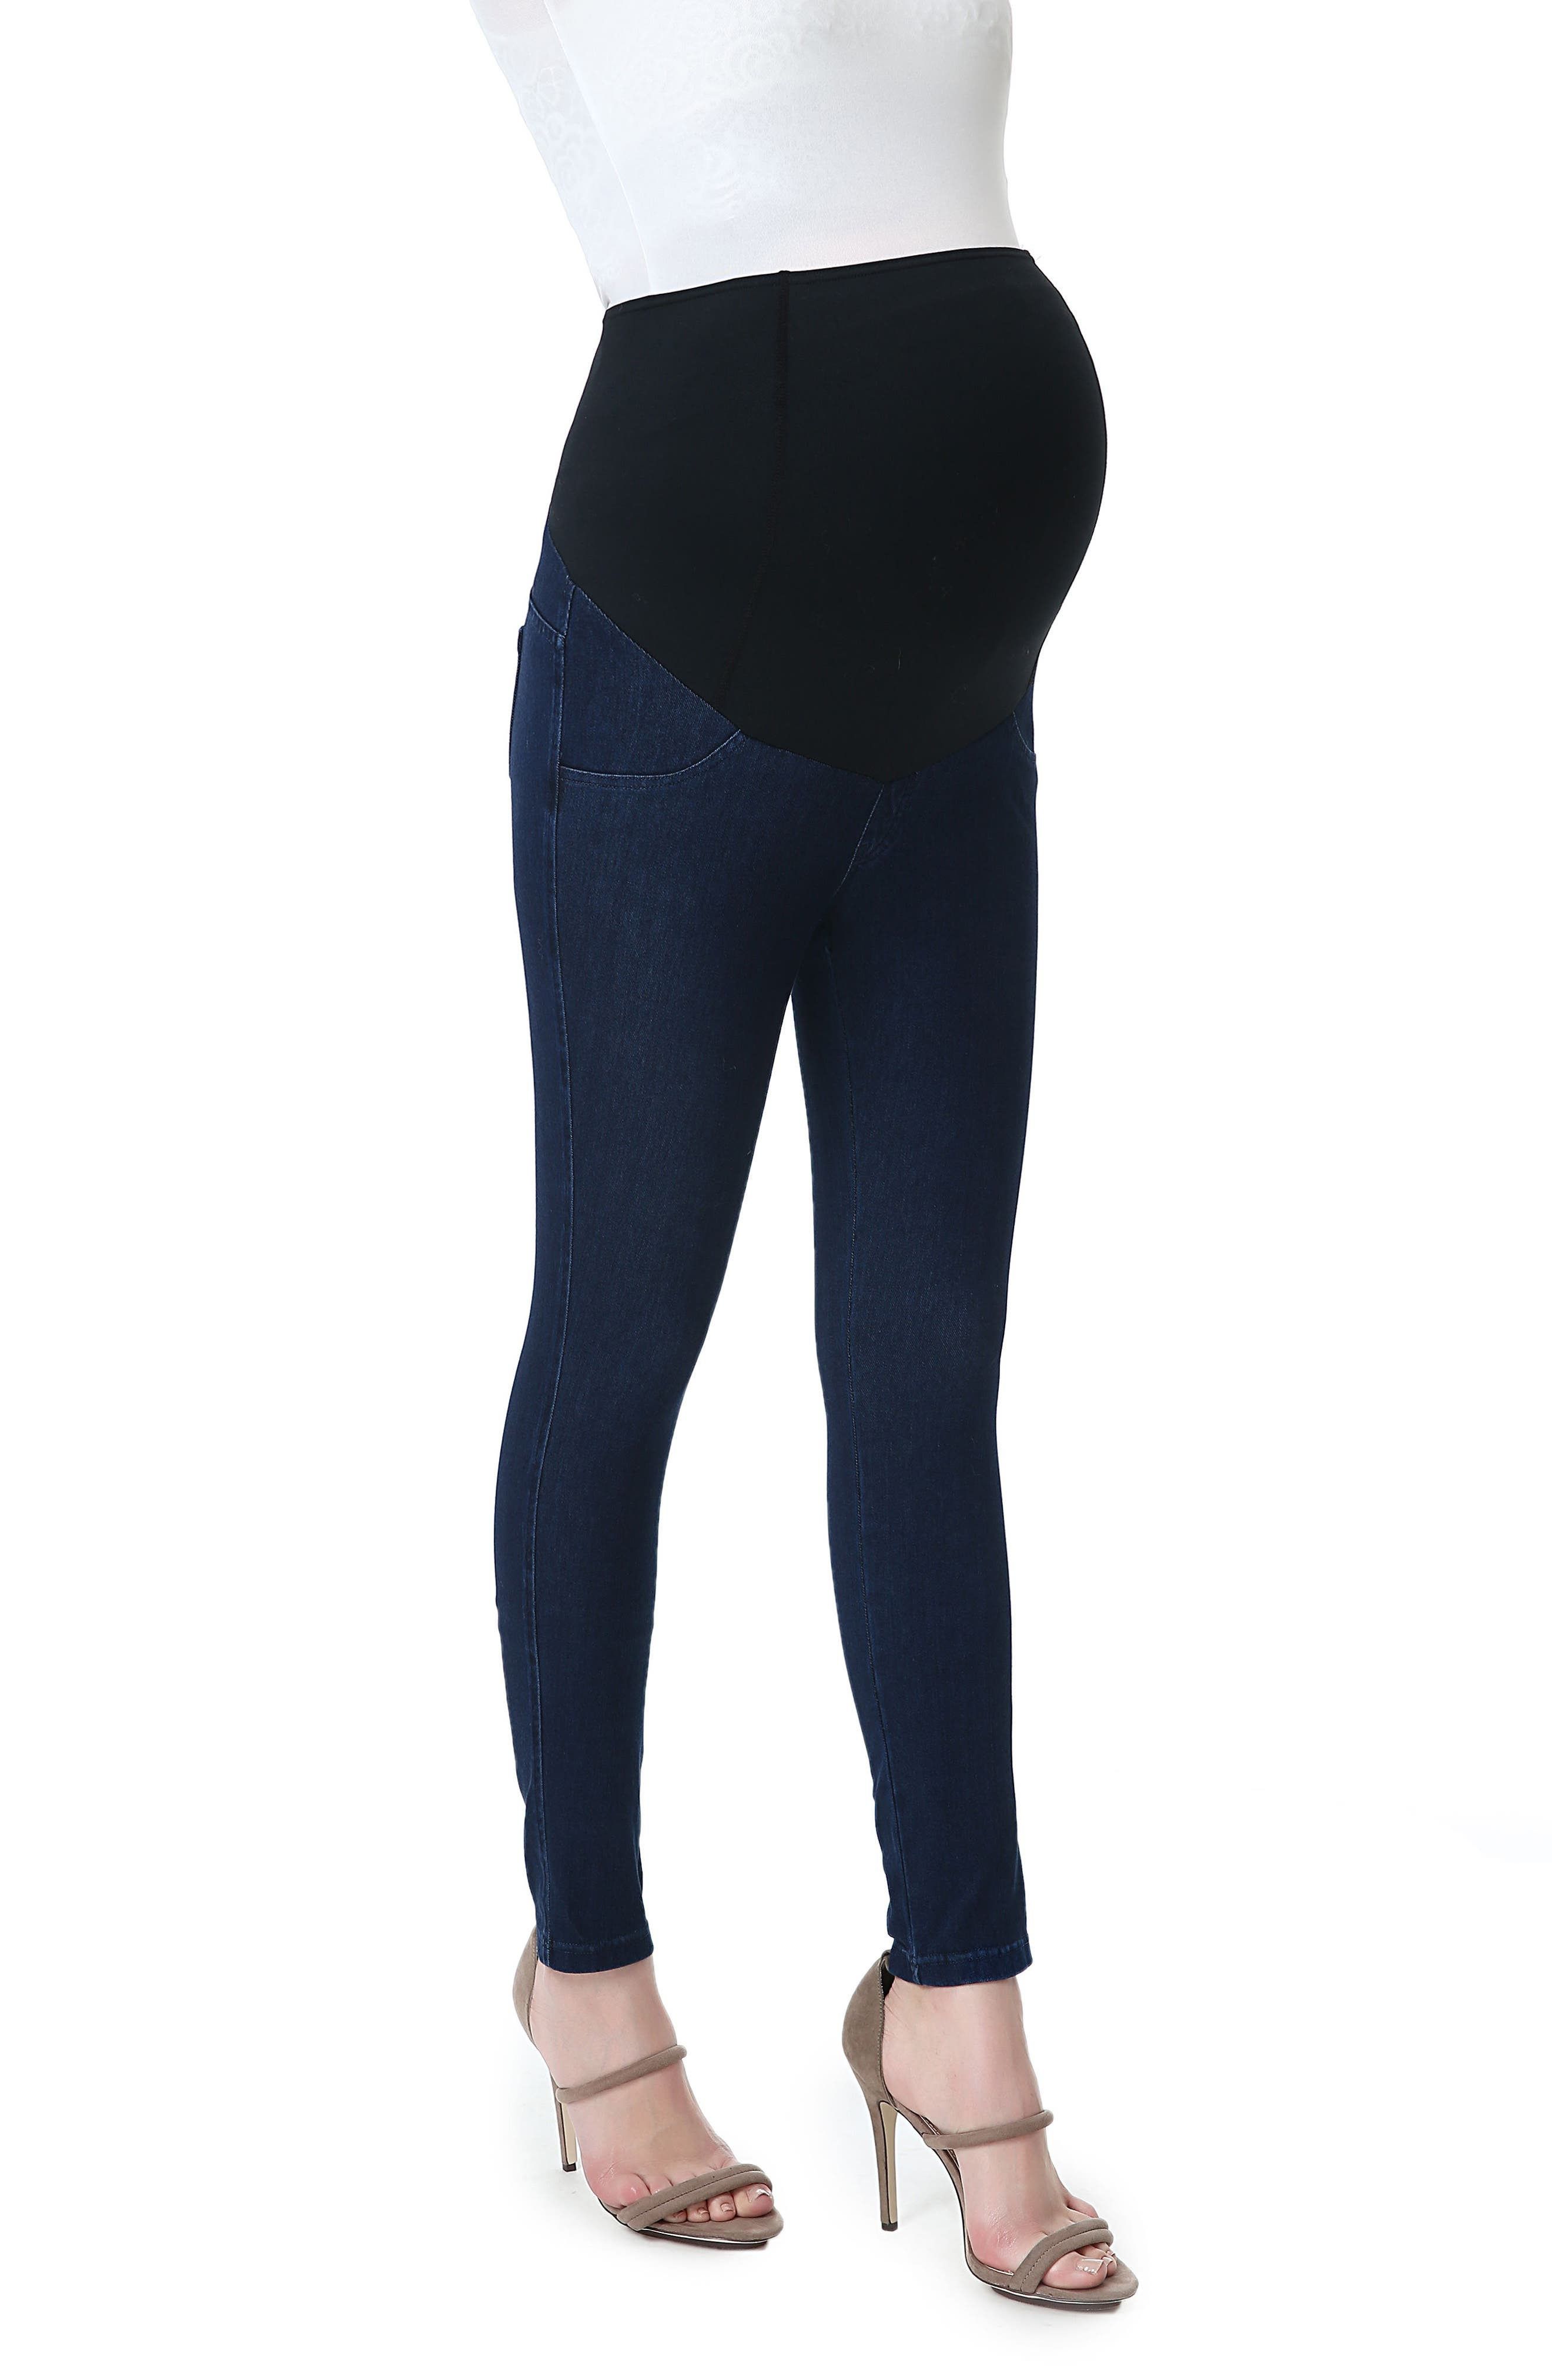 Alternate Image 1 Selected - Kimi & Kai Lenora Maternity Leggings